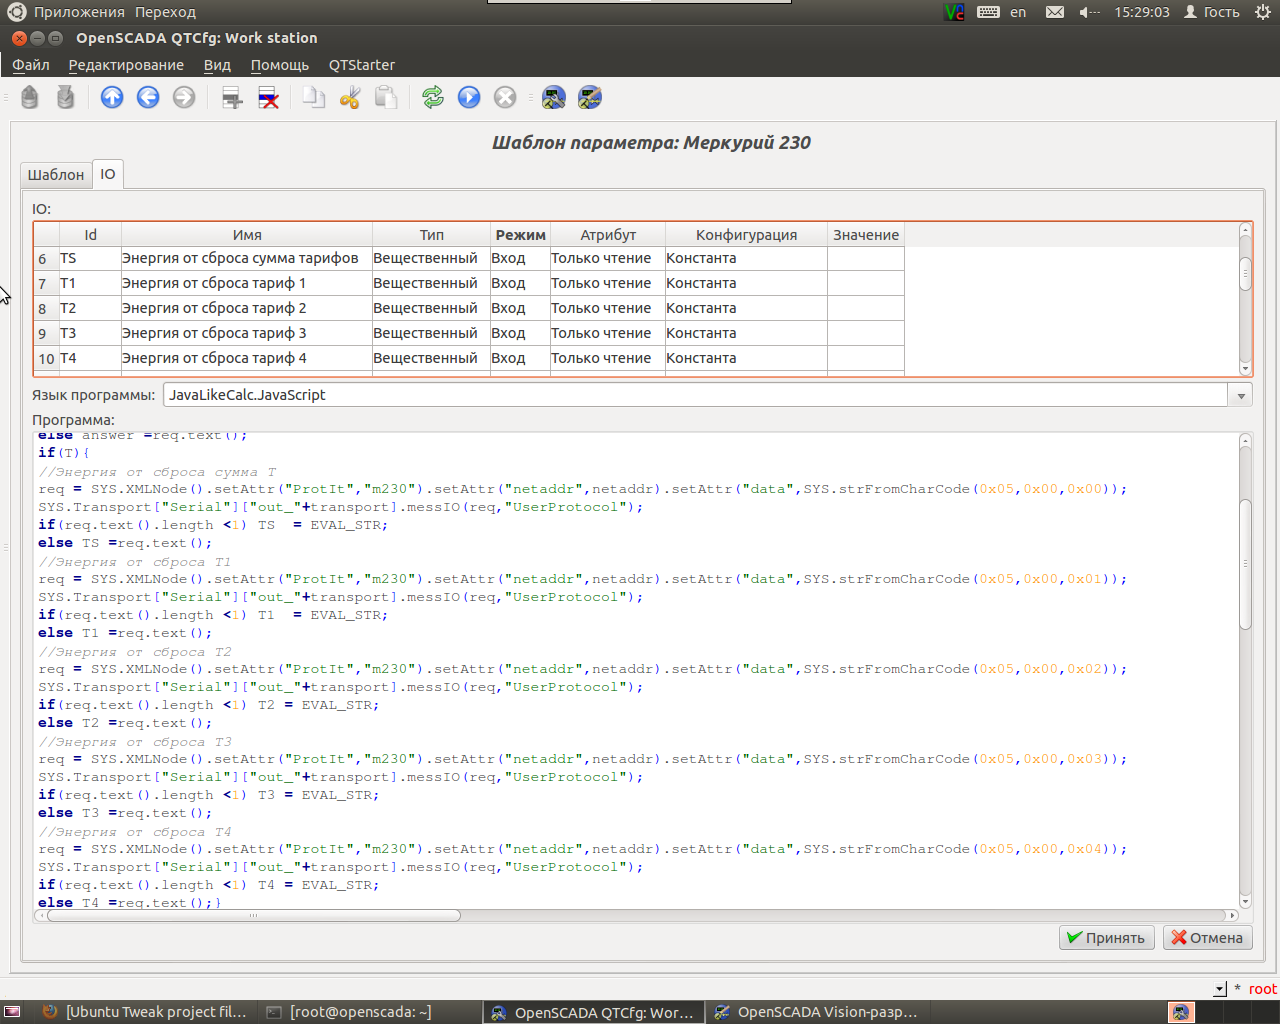 Пишем протоколы счетчиков Меркурий 230 и Меркурий 200 для OpenSCADA - 12